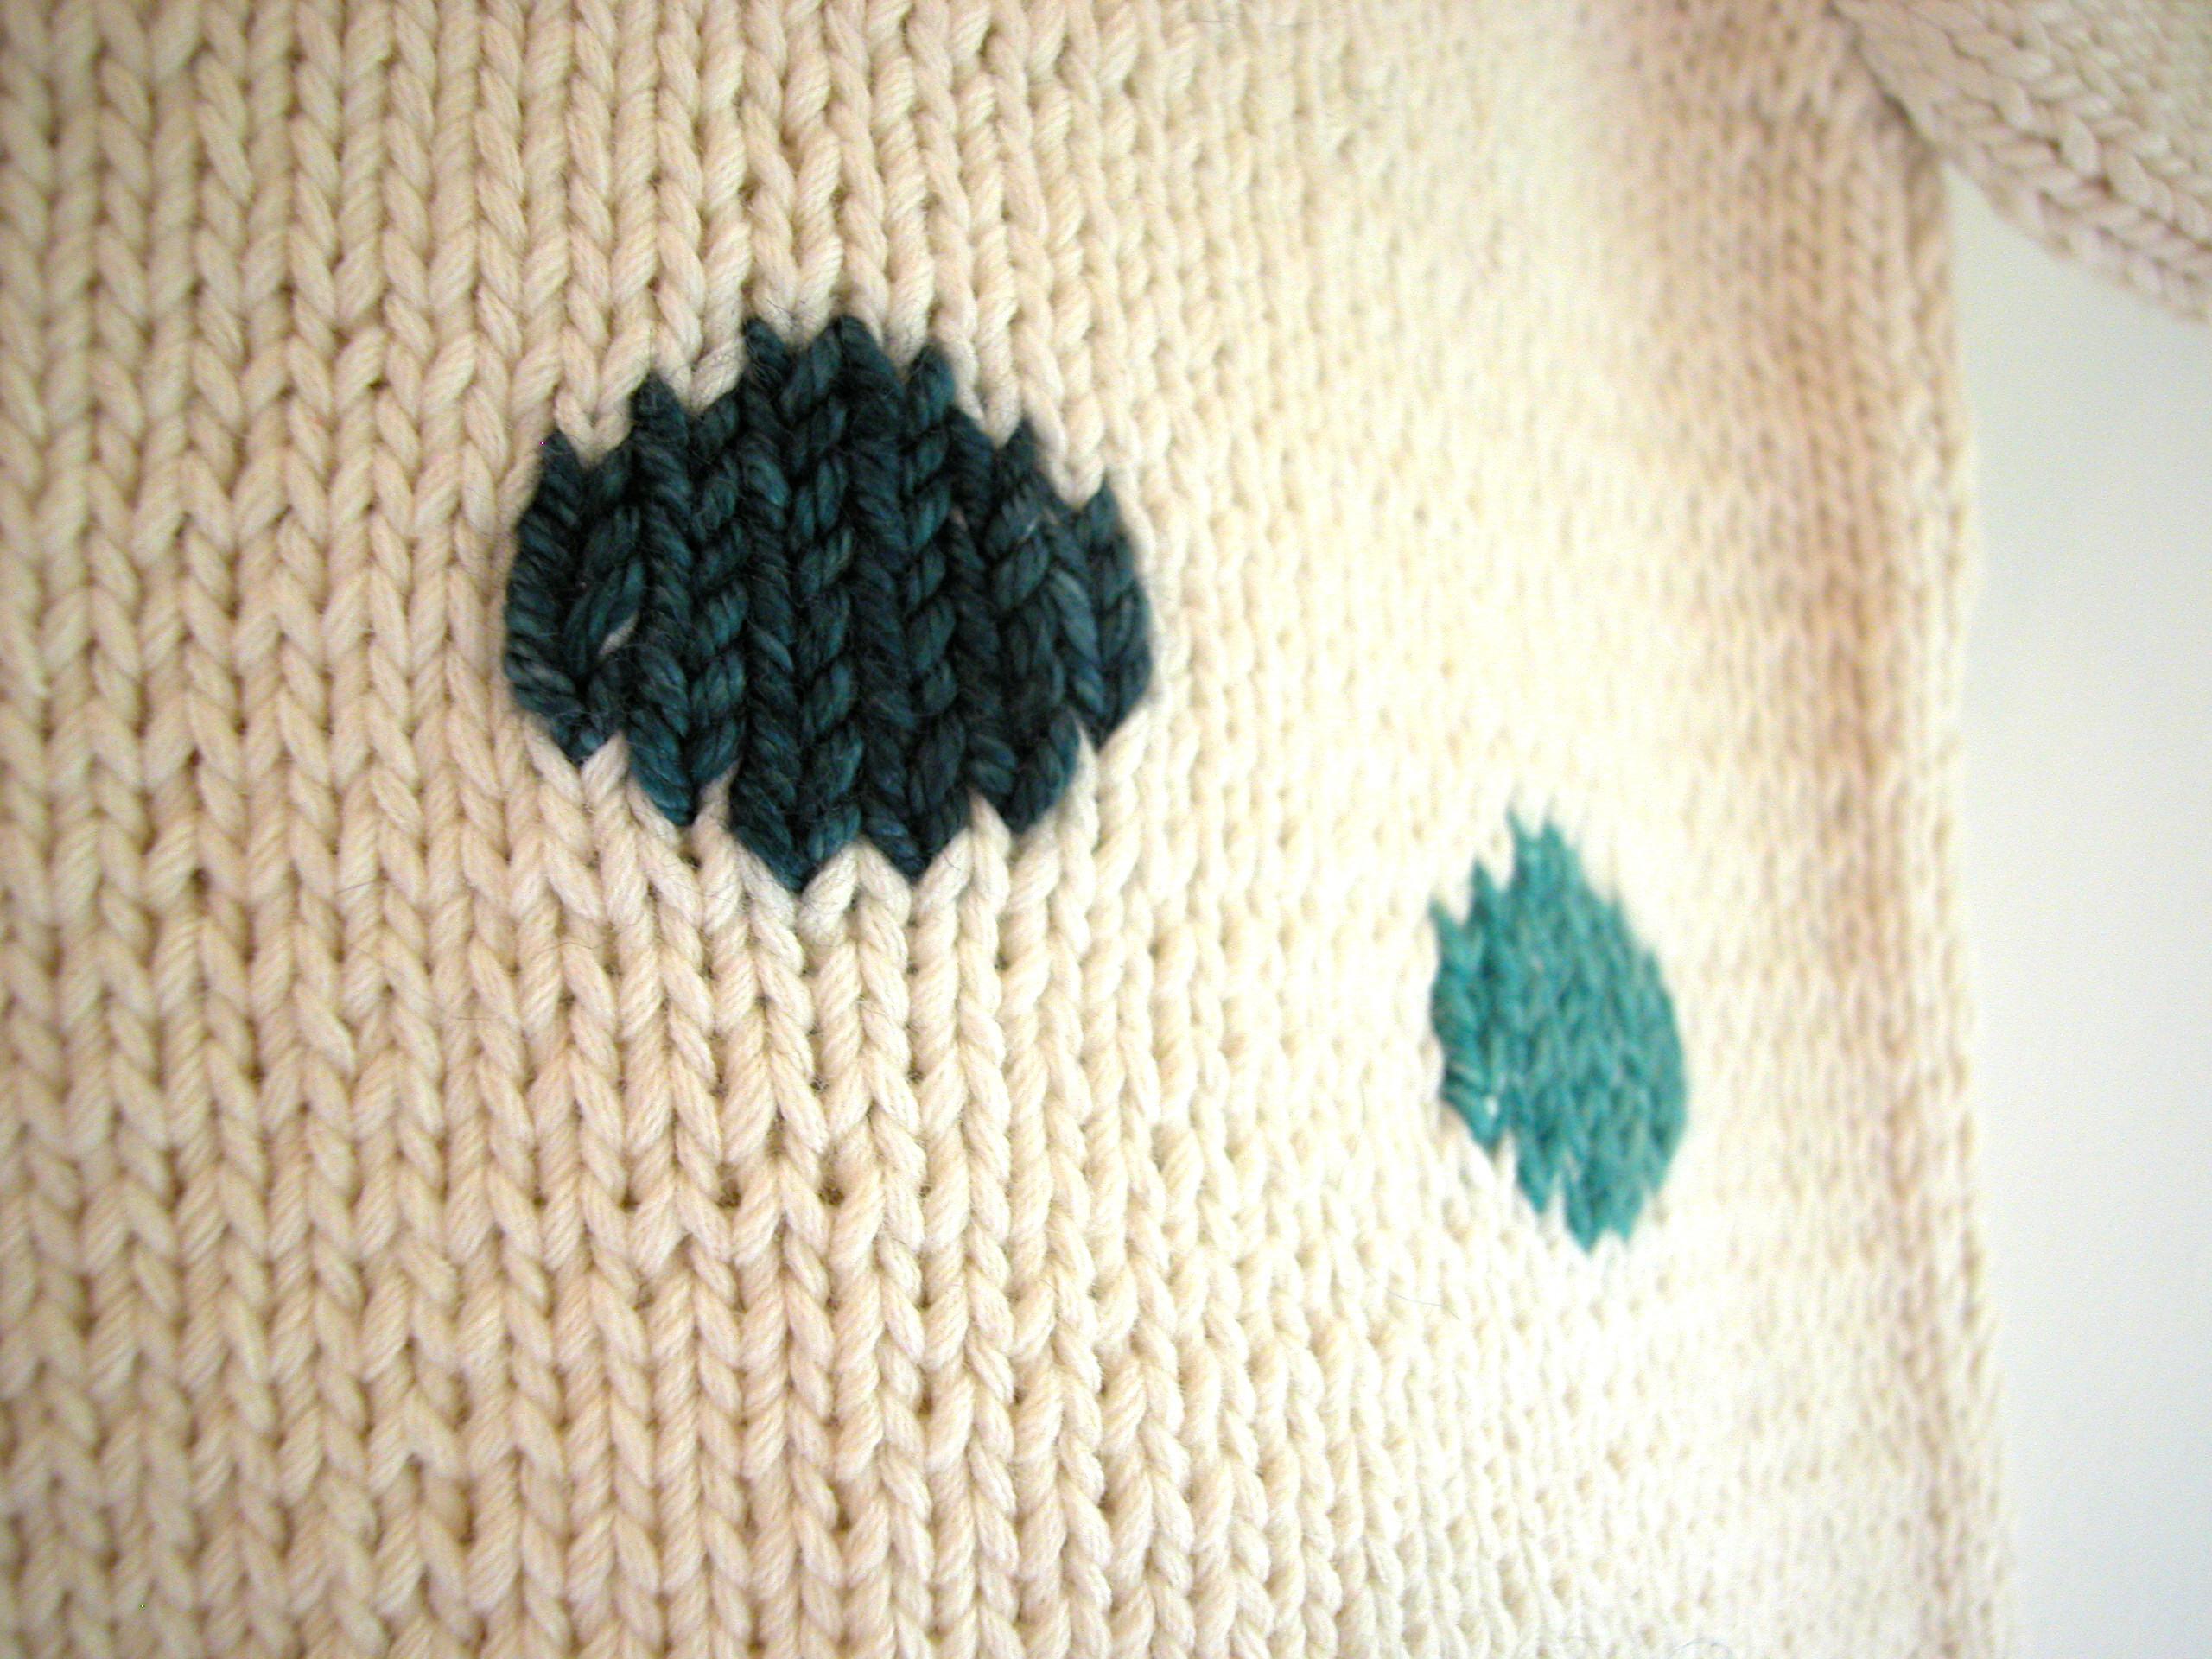 Duplicate Stitch Tutorial The Knit Cafe